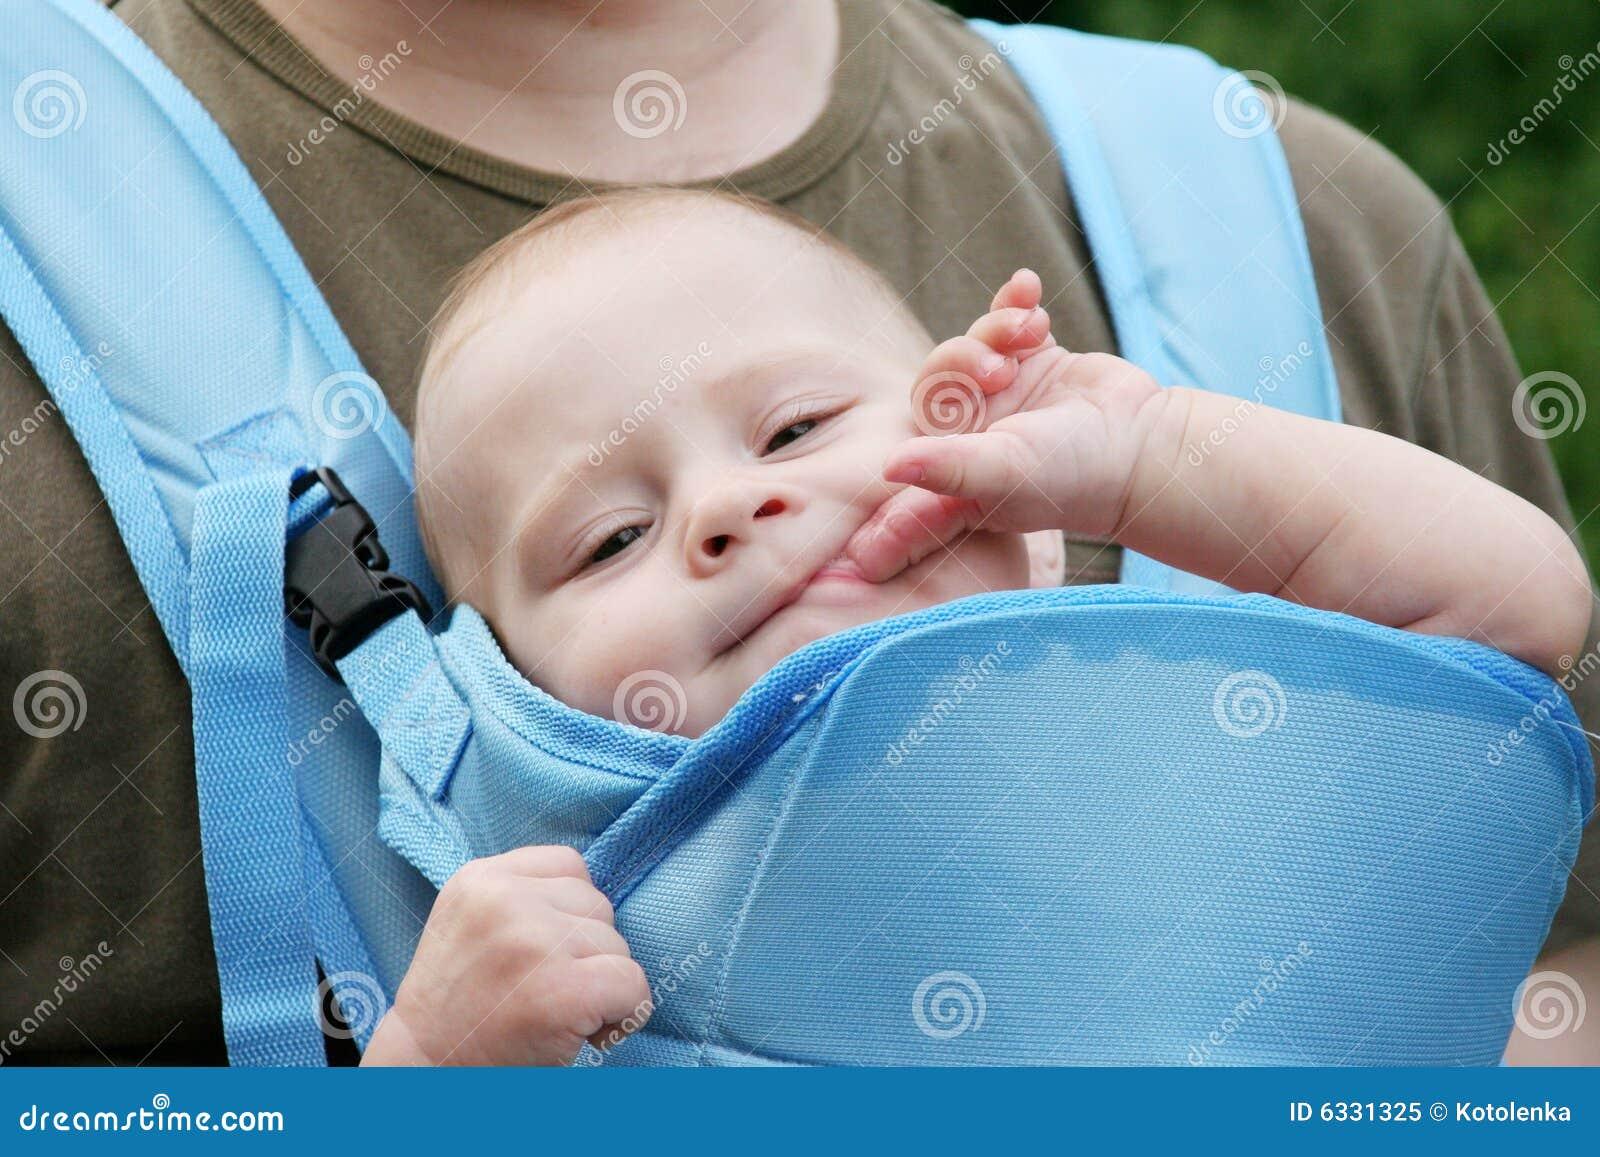 Palec do dziecka